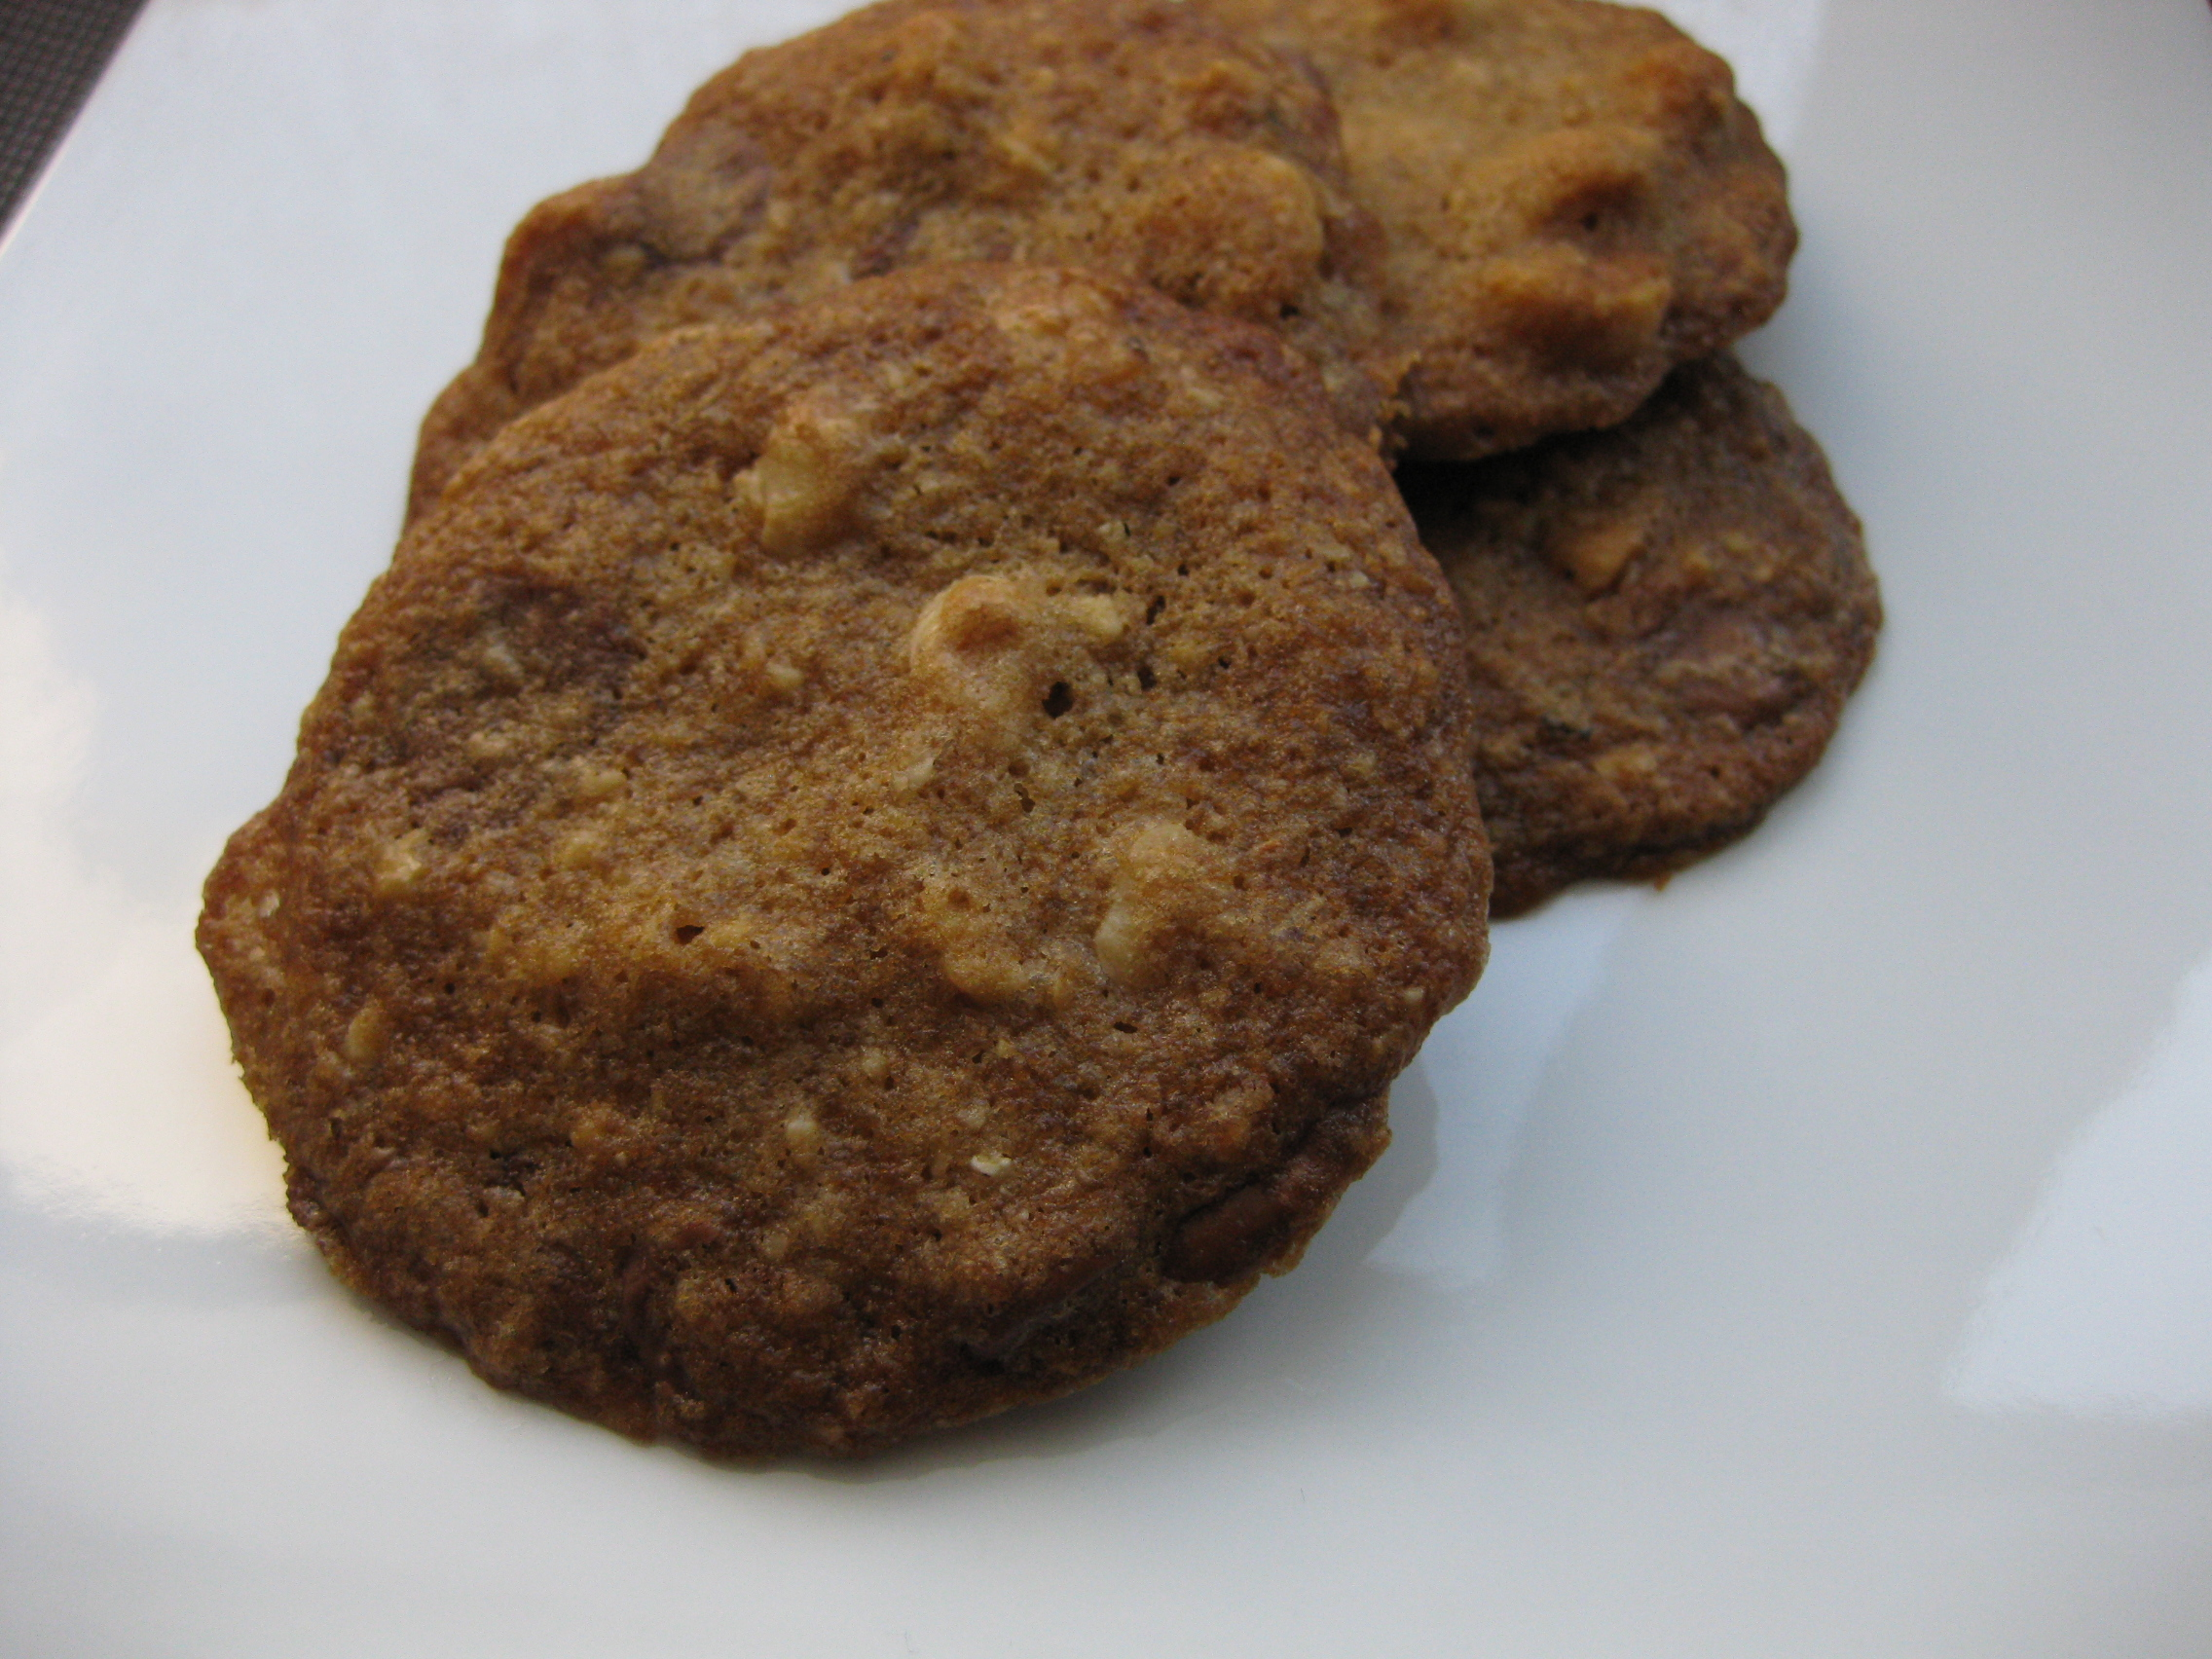 Flour Bakery's Chocolate Chip Hazelnut Cookies